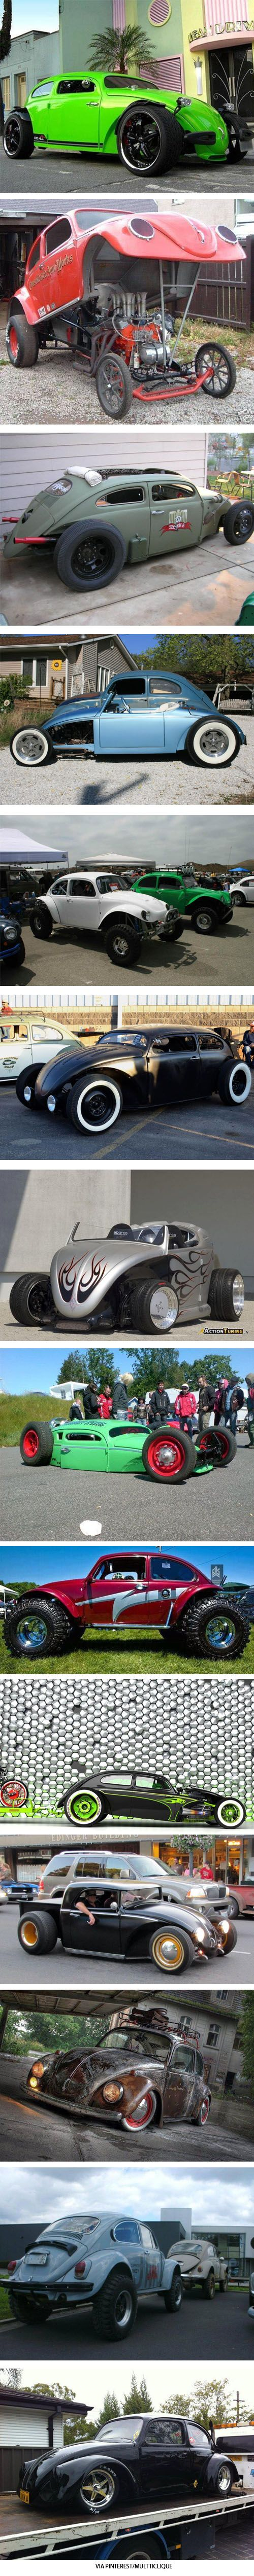 40 VW beetles too crazy